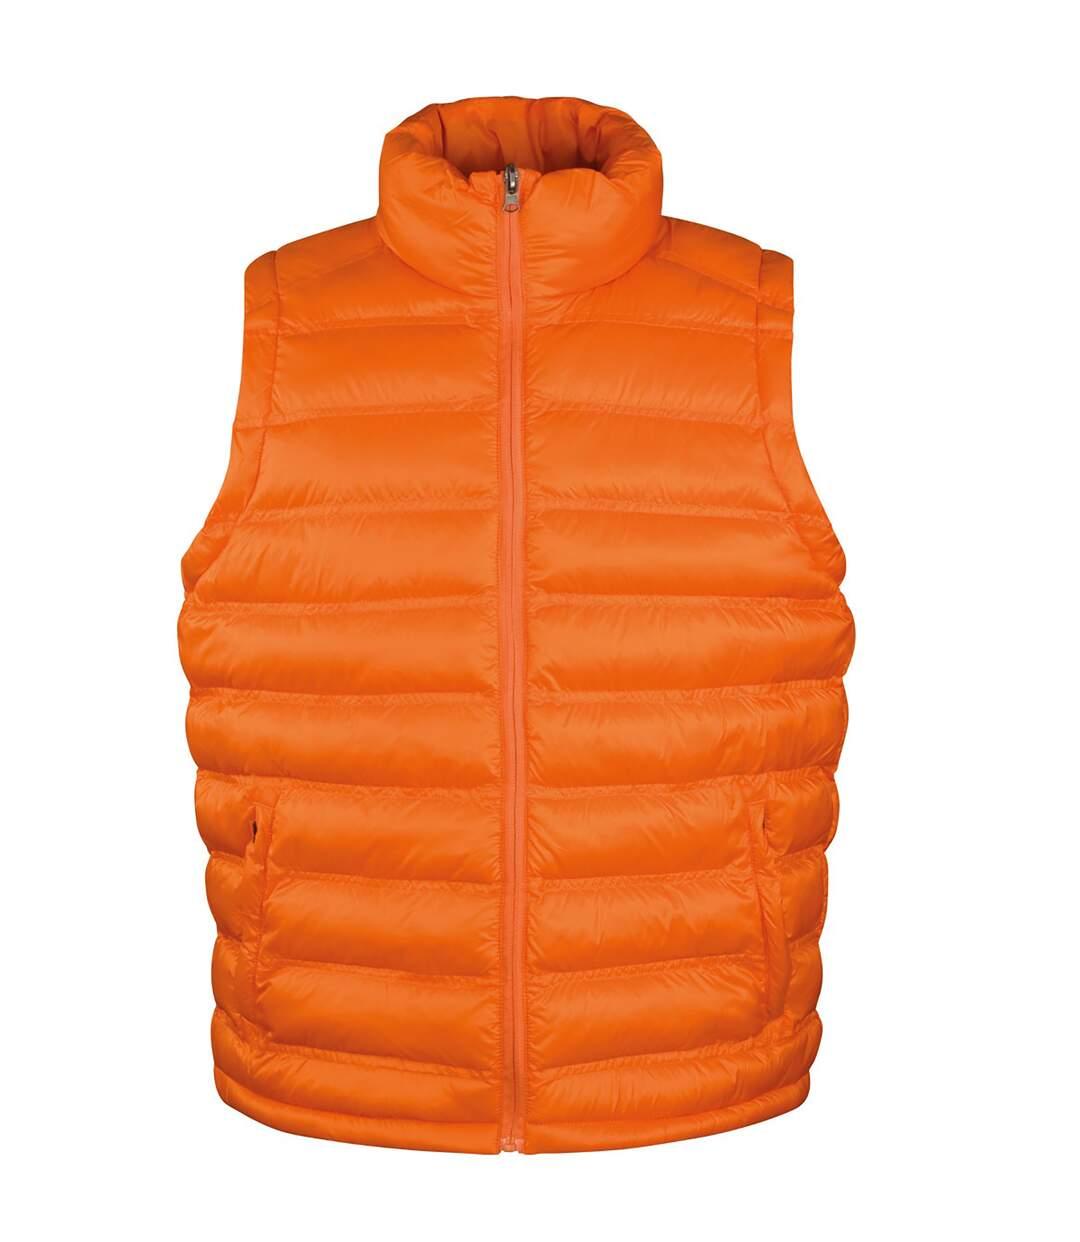 Result Mens Ice Bird Padded Bodywarmer / Gilet Jacket (Orange) - UTBC2726